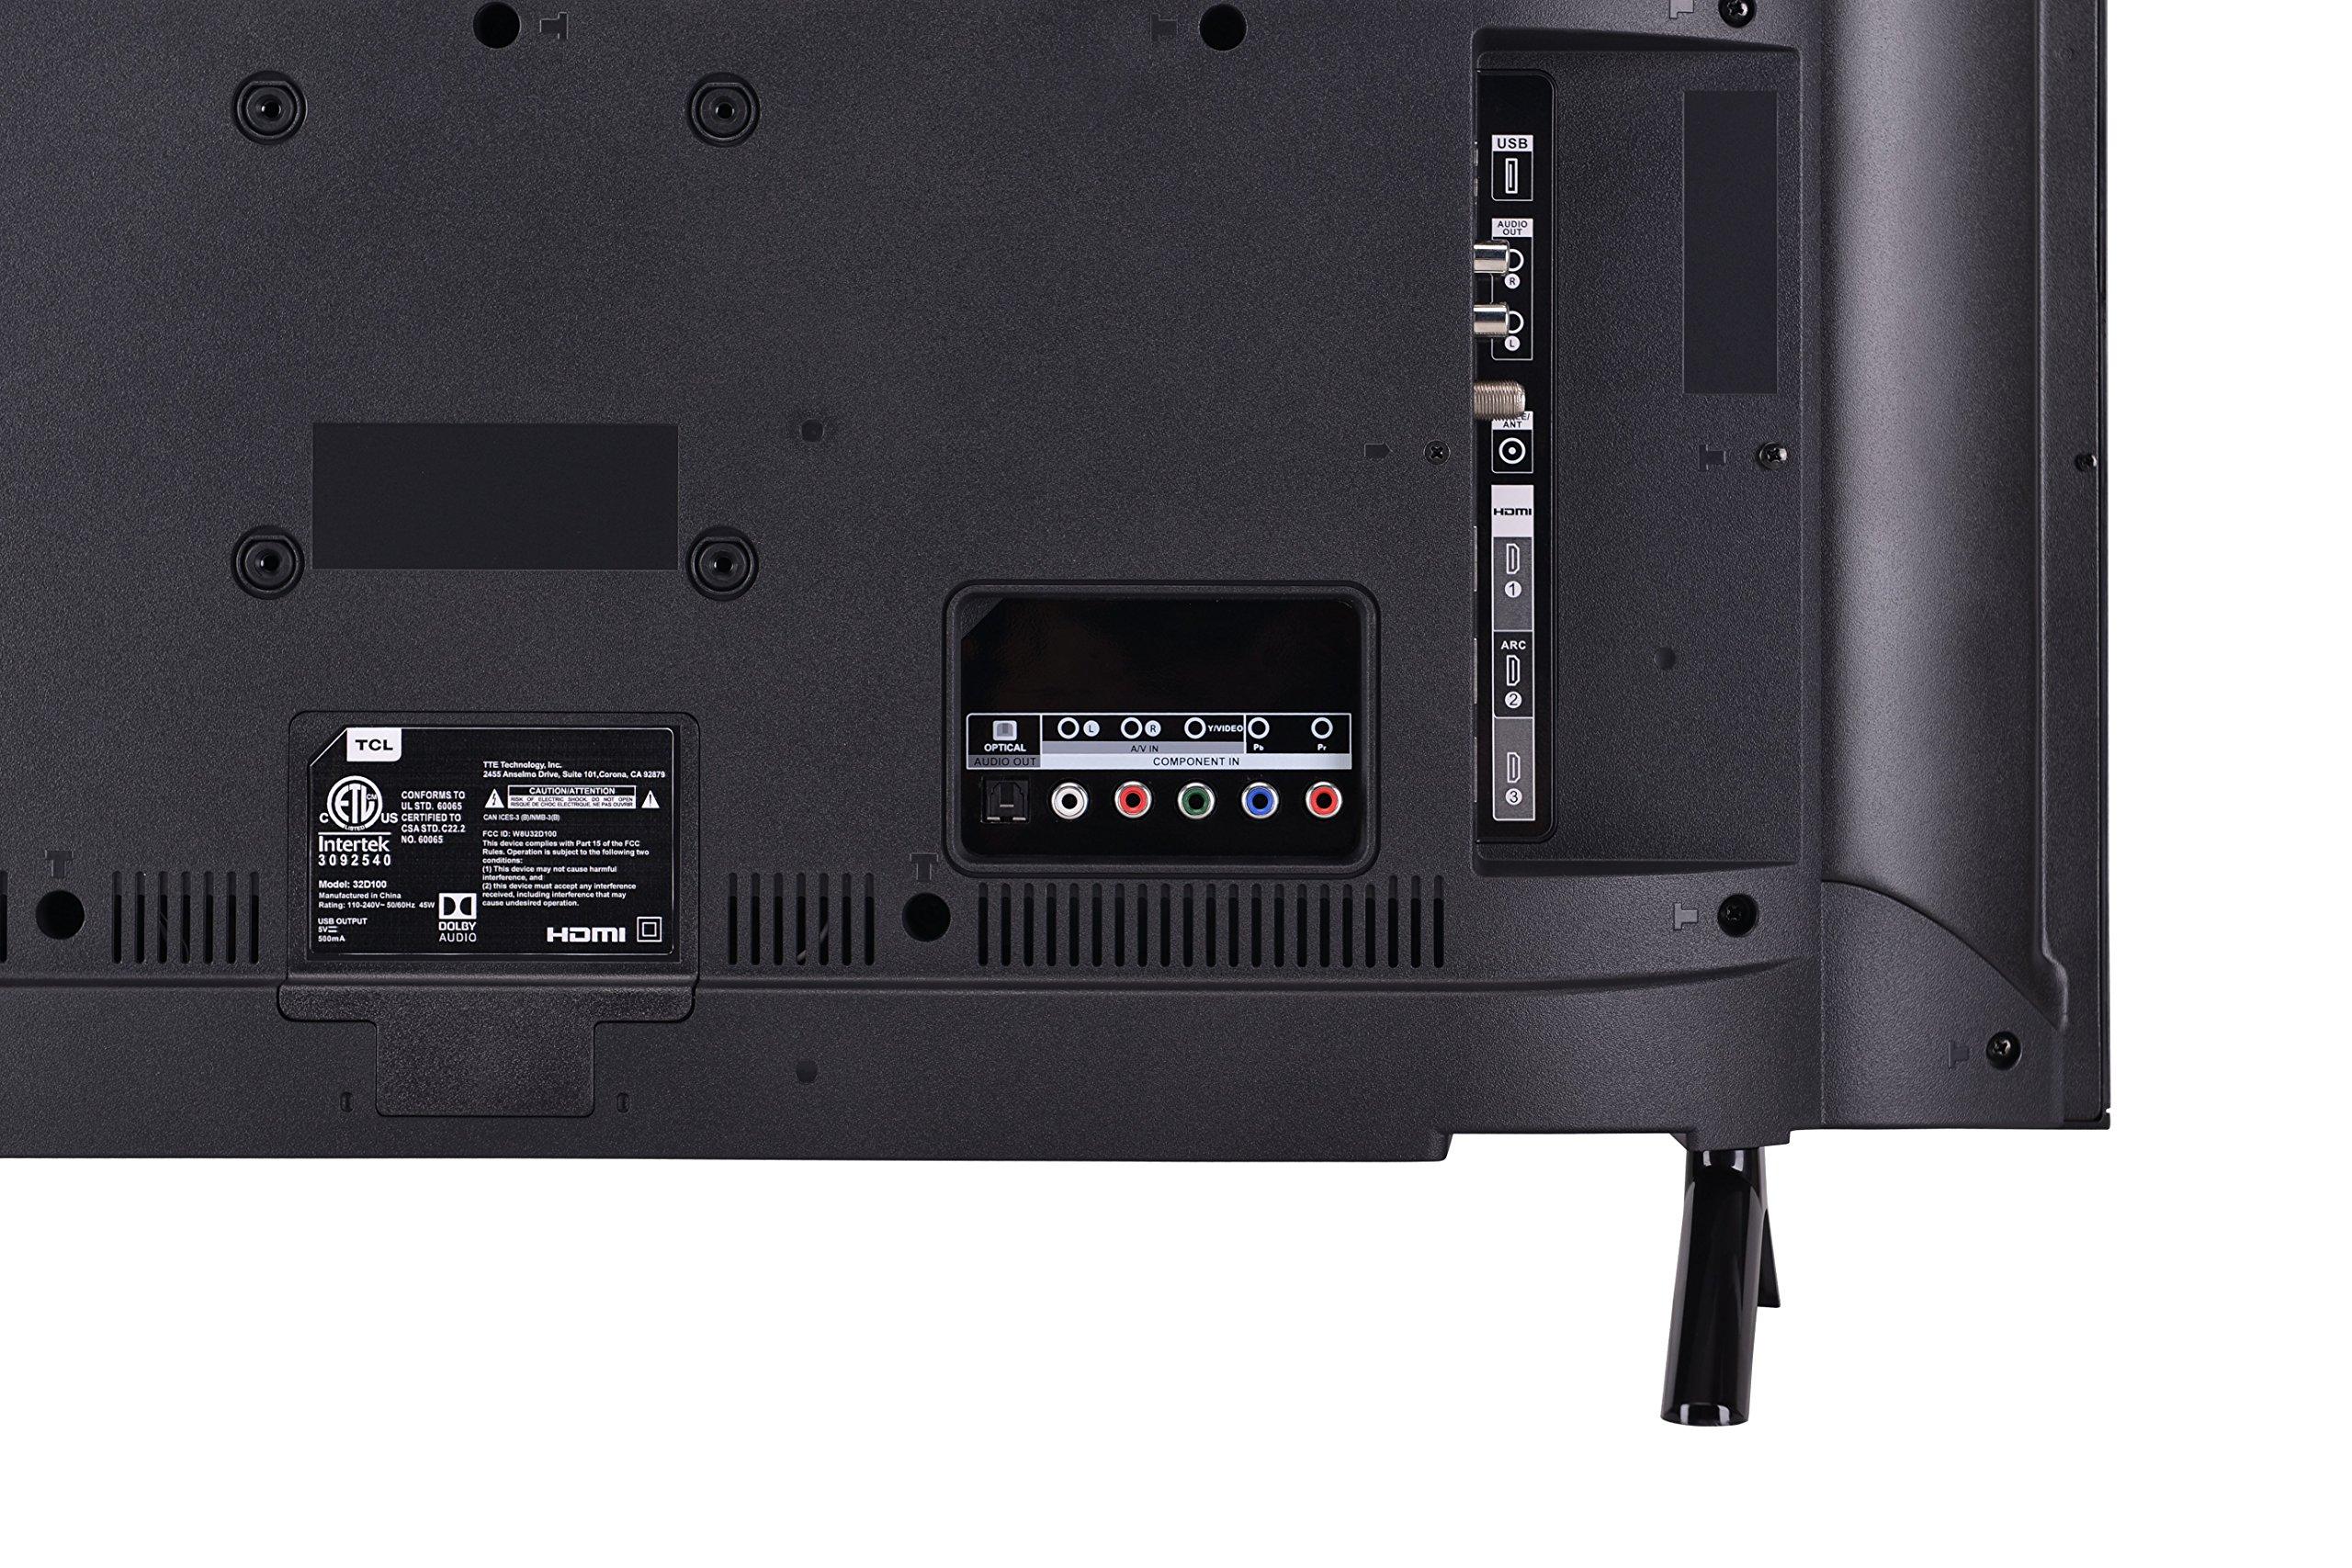 TCL 32'' 720p LED TV (2018) (32D100-B) by TCL (Image #4)